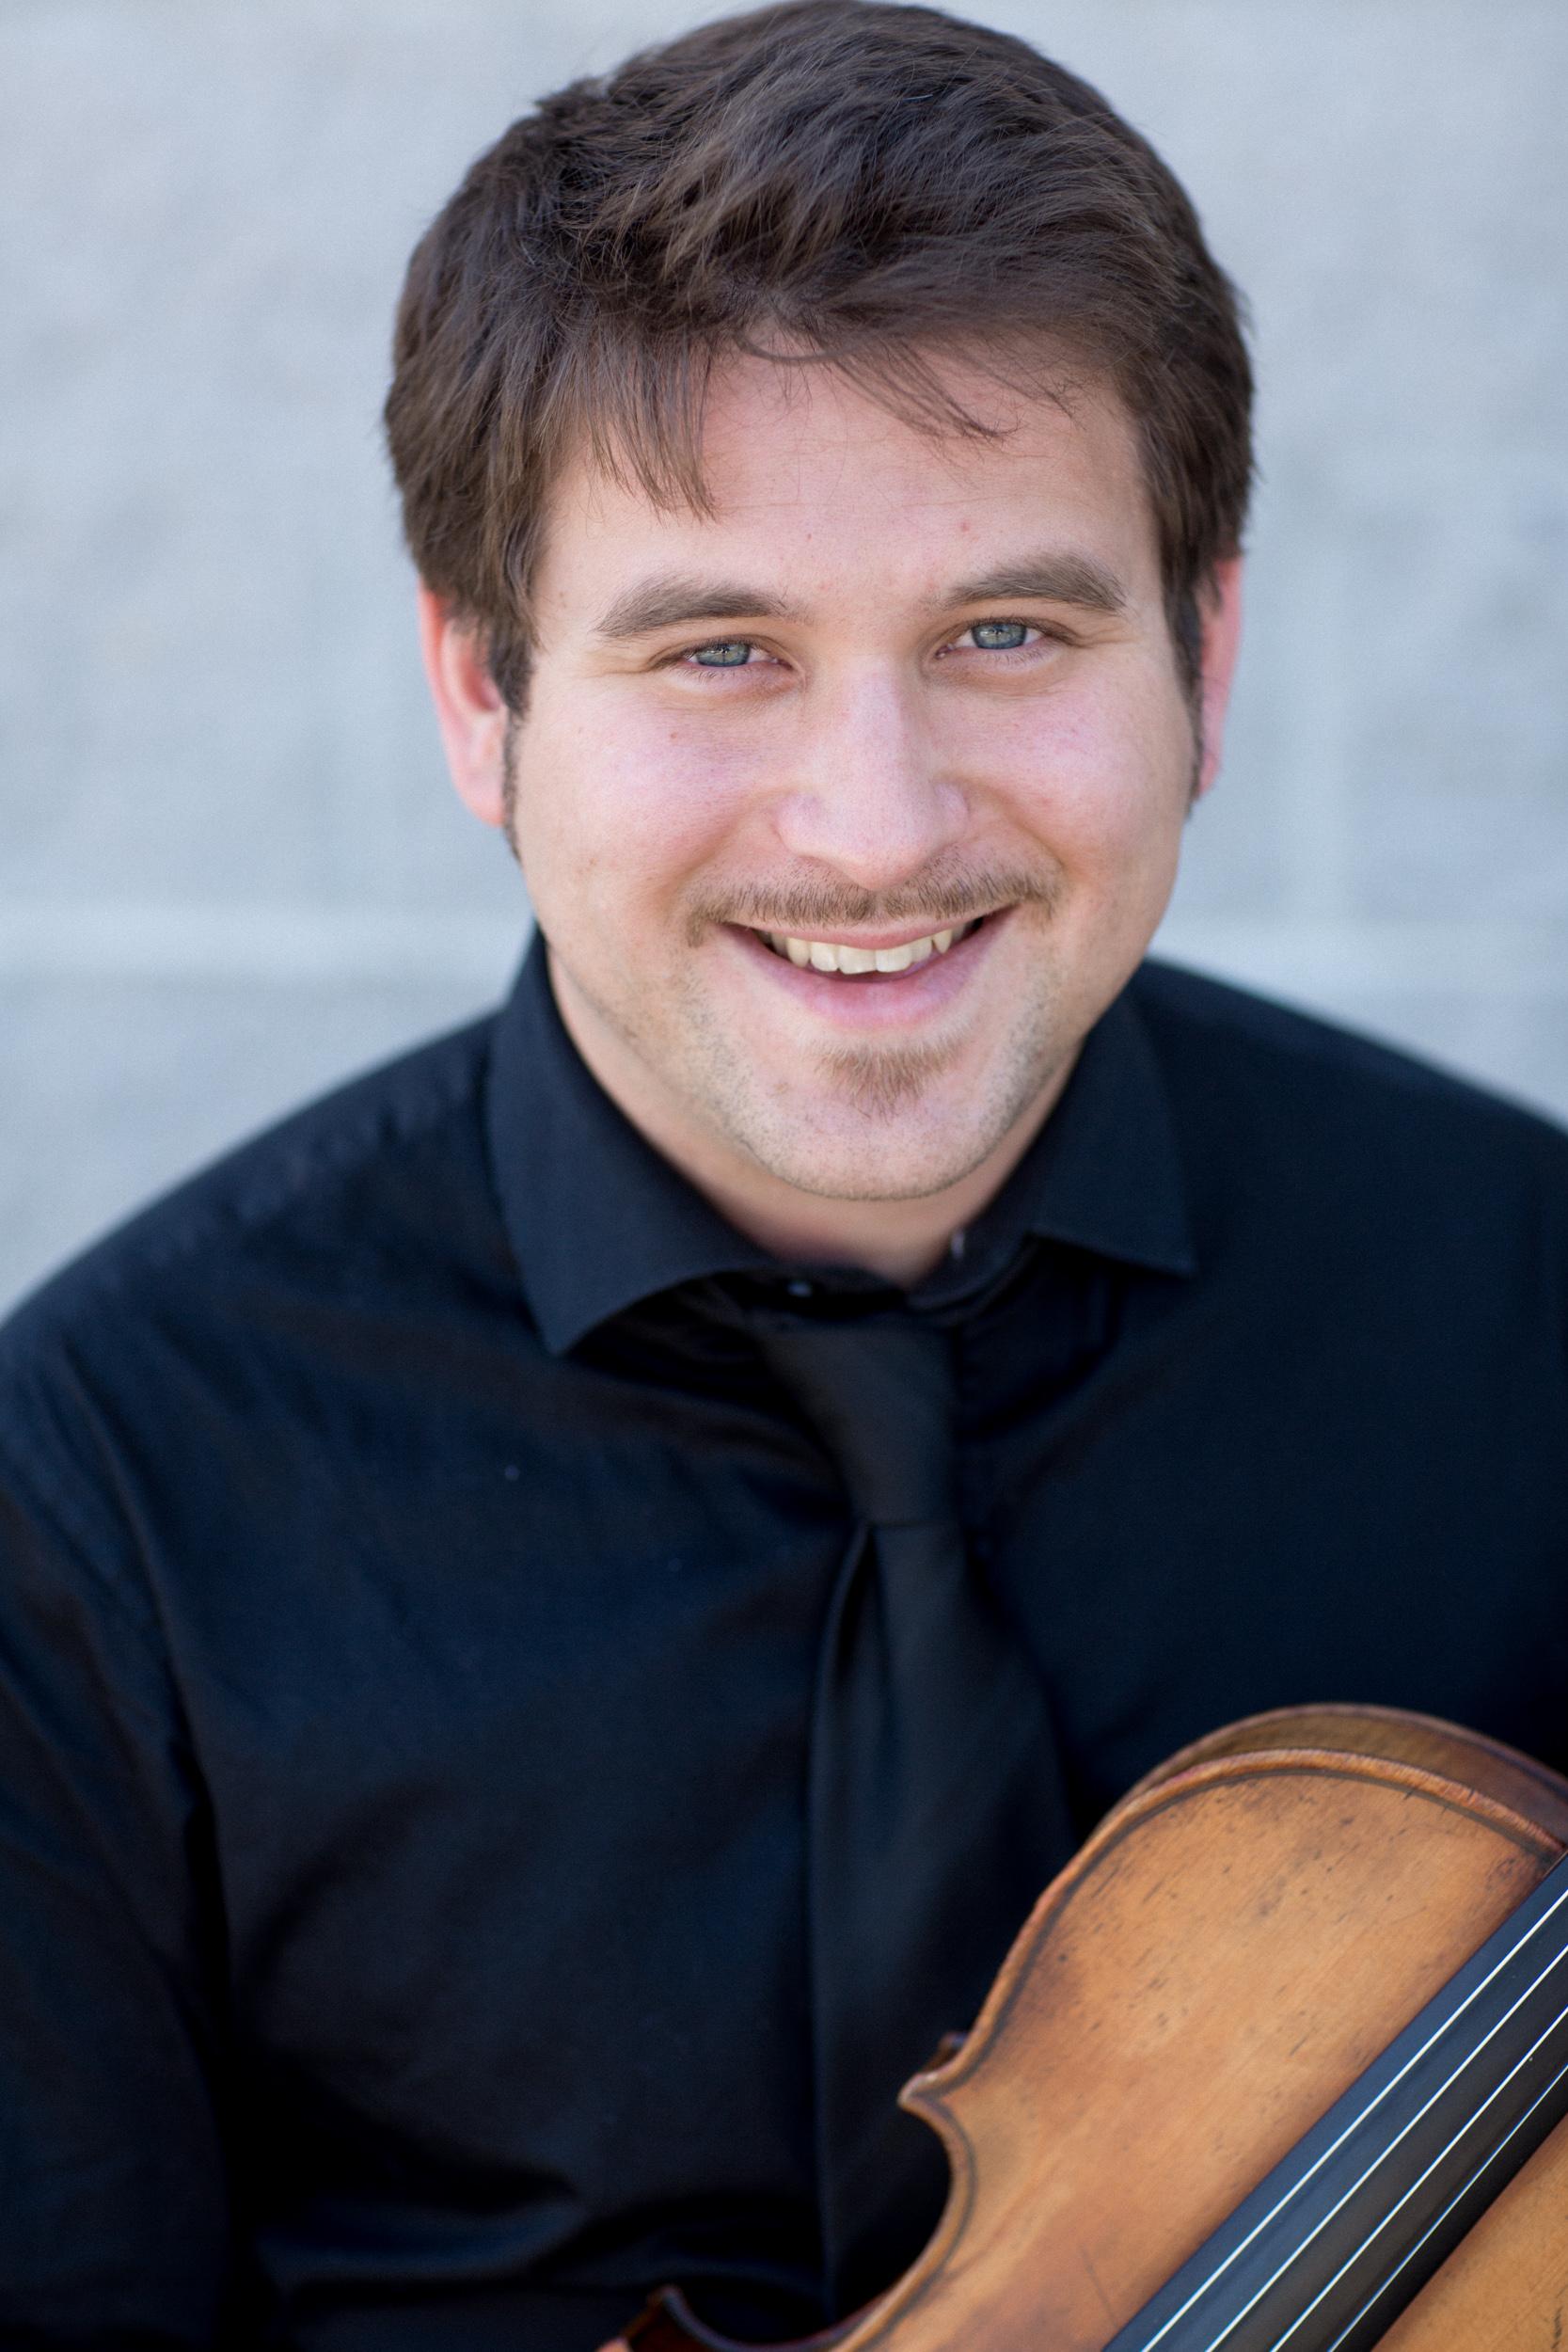 Alex Volonts, viola